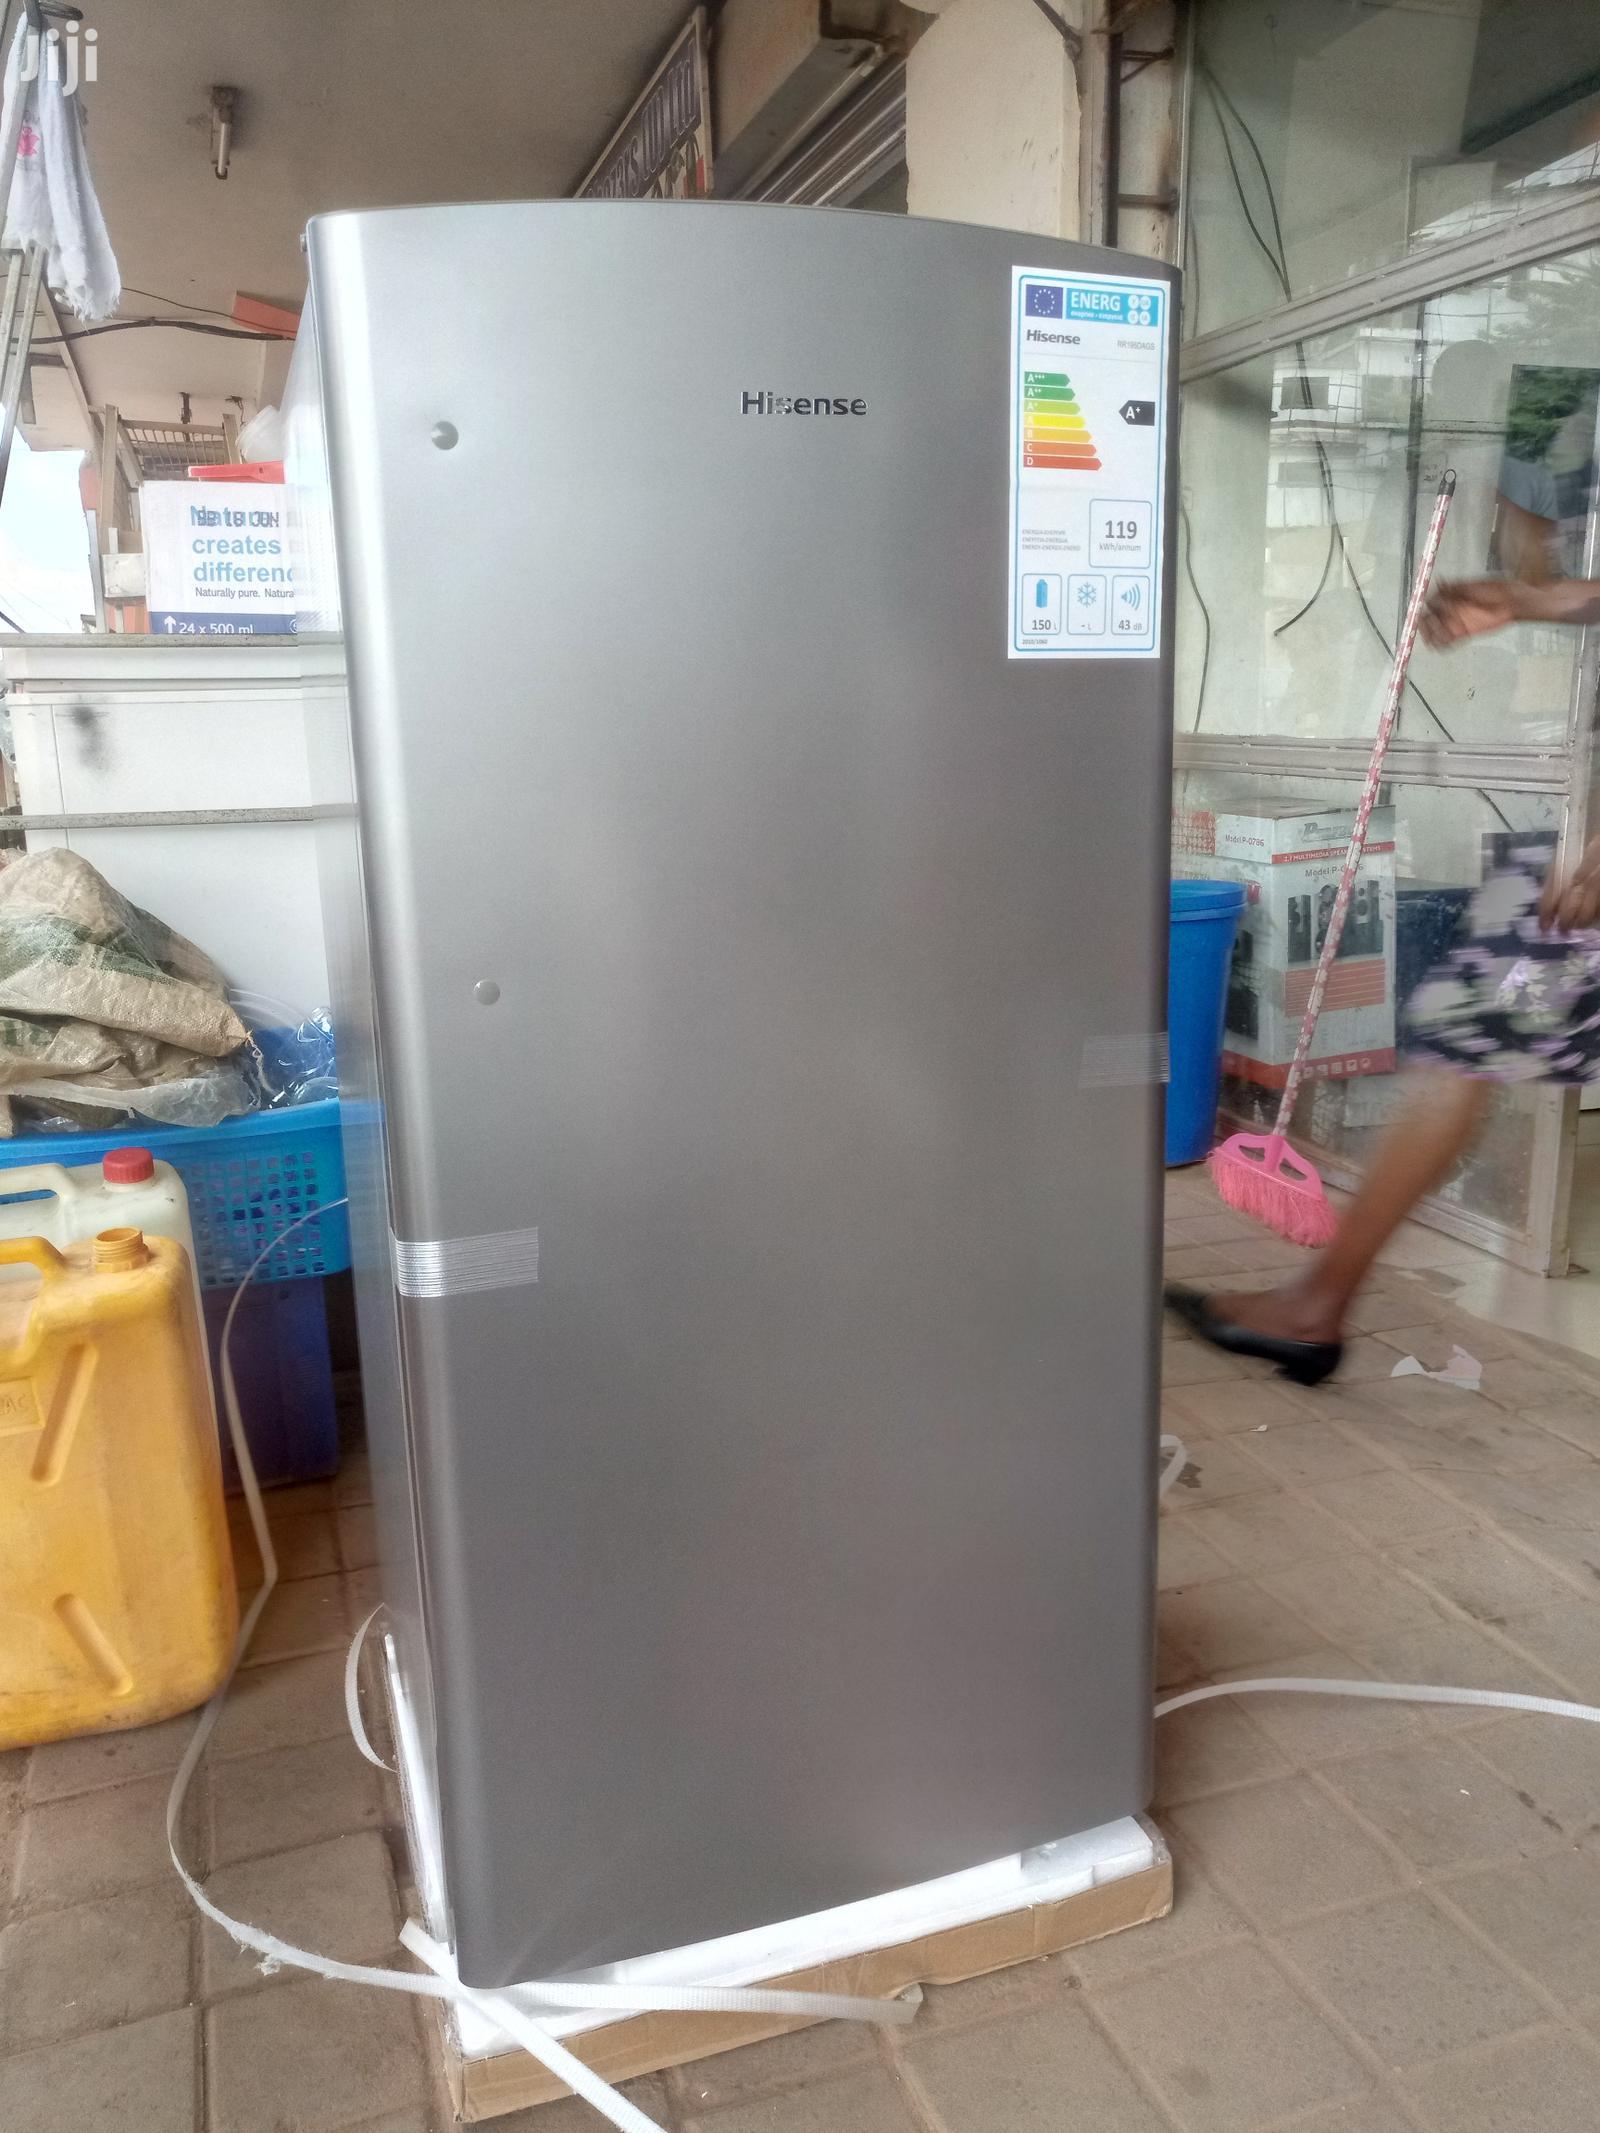 Hisense Single Door Refrigerator 195L